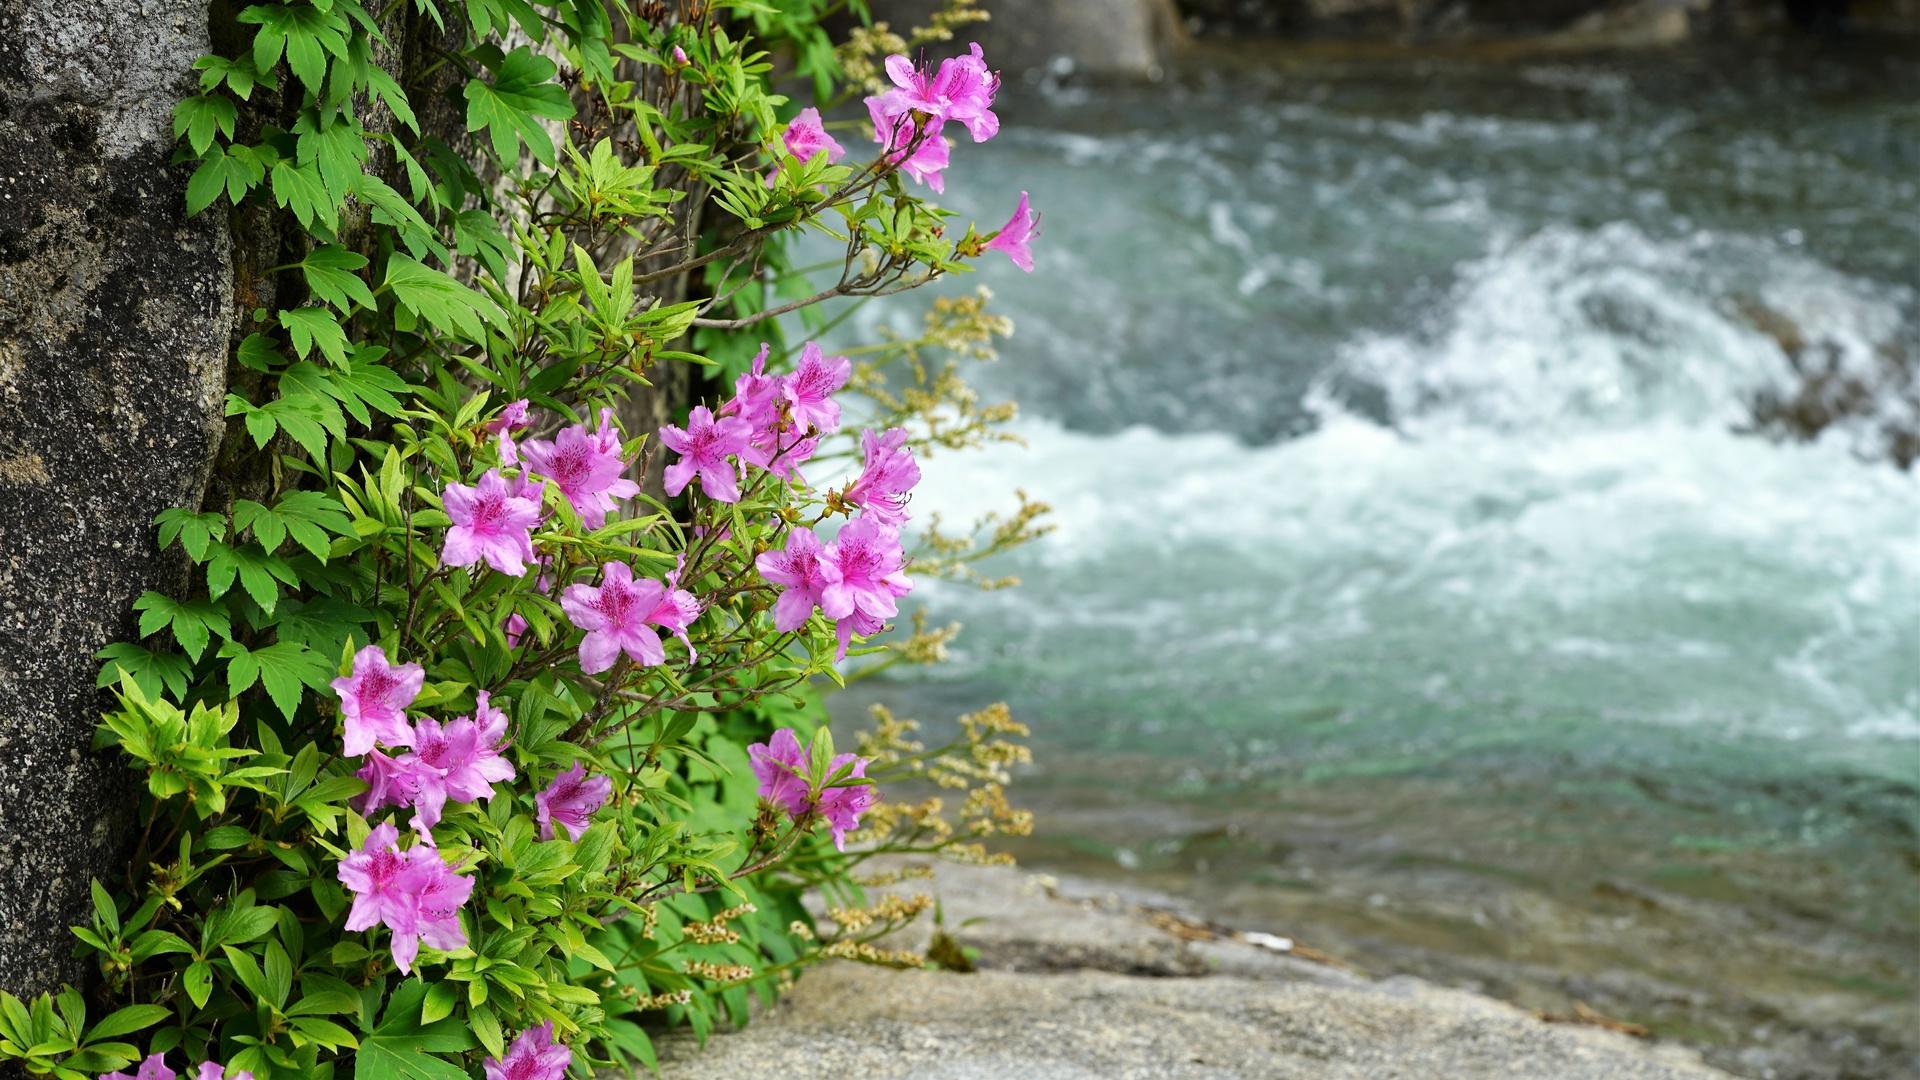 цветы, азалия, вода, лето